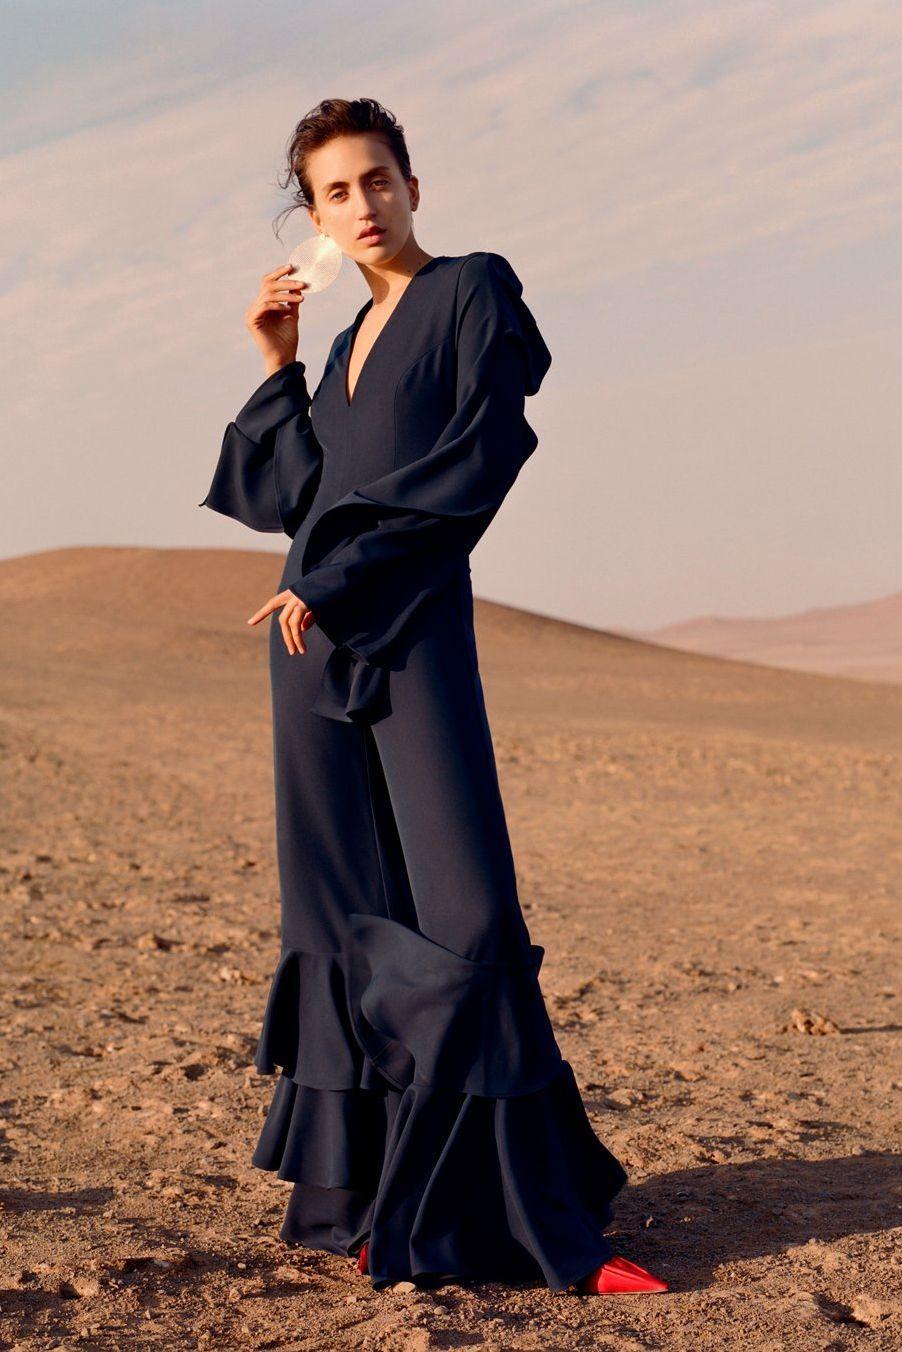 530e526c9c071 10 Affordable Fashion Sites You Probably Haven't Heard Of Yet Mafia, Abrigo  De